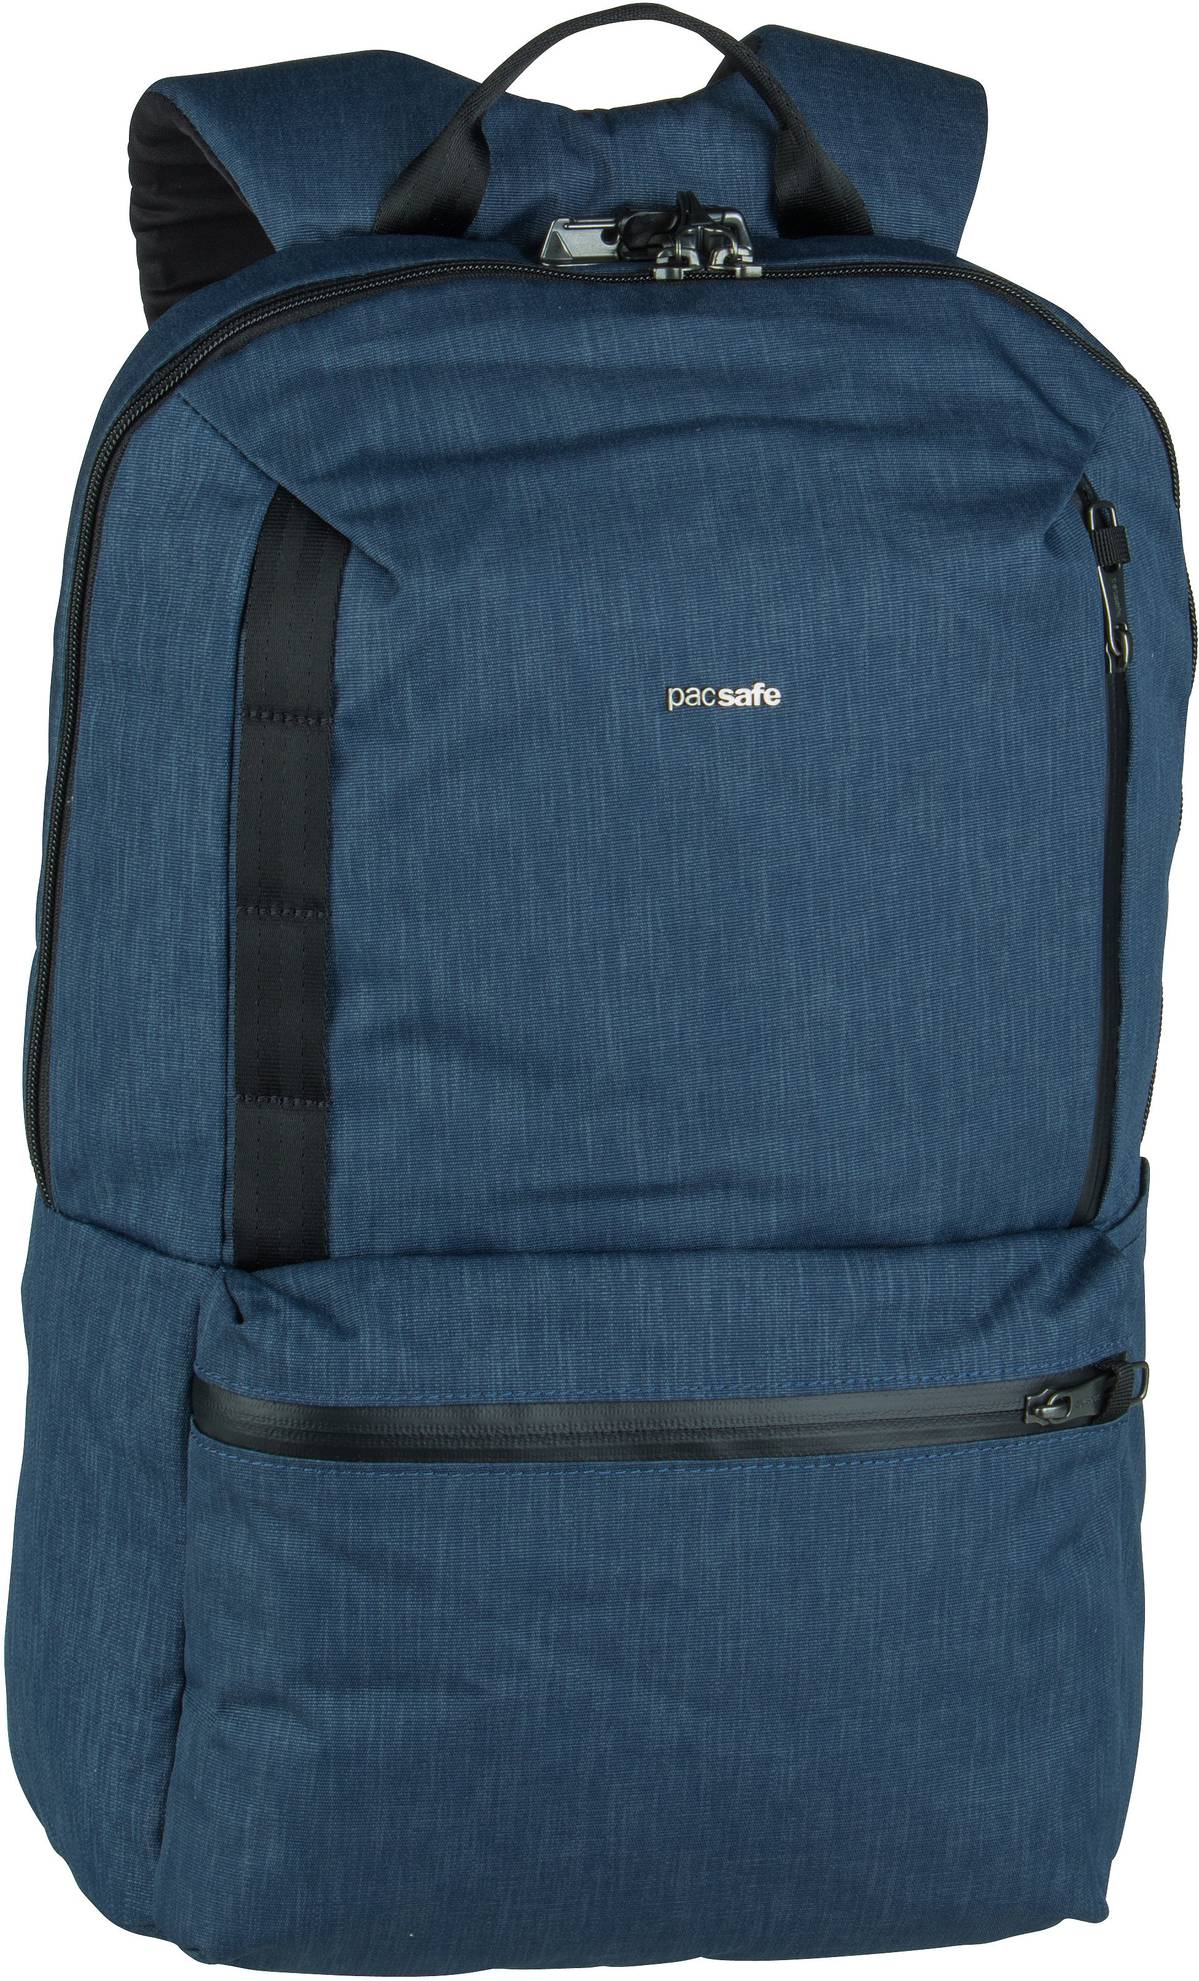 Rucksack / Daypack Metrosafe X Backpack Dark Denim (20 Liter)